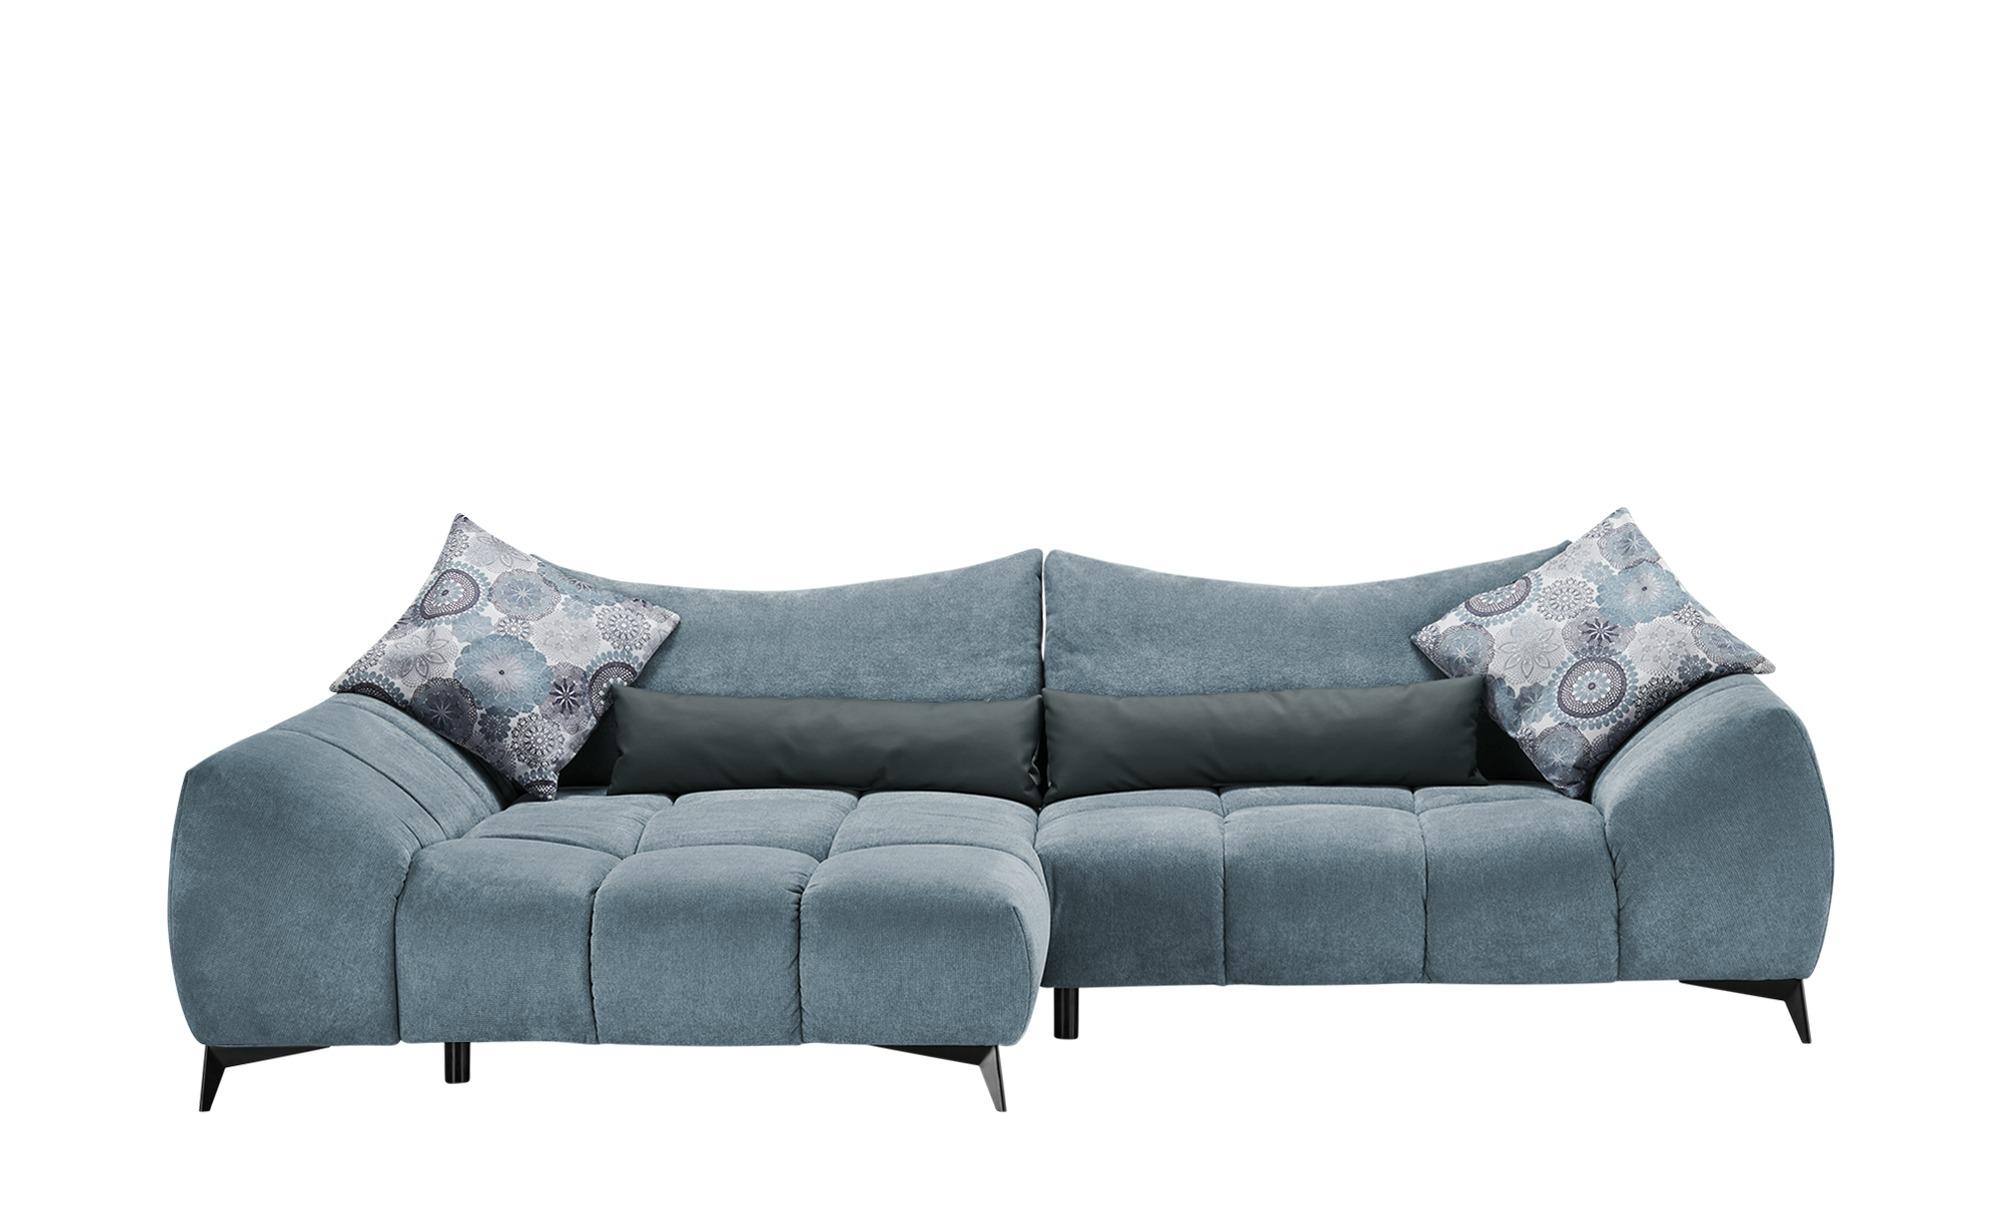 bobb ecksofa blau 91 cm polsterm bel sofas. Black Bedroom Furniture Sets. Home Design Ideas